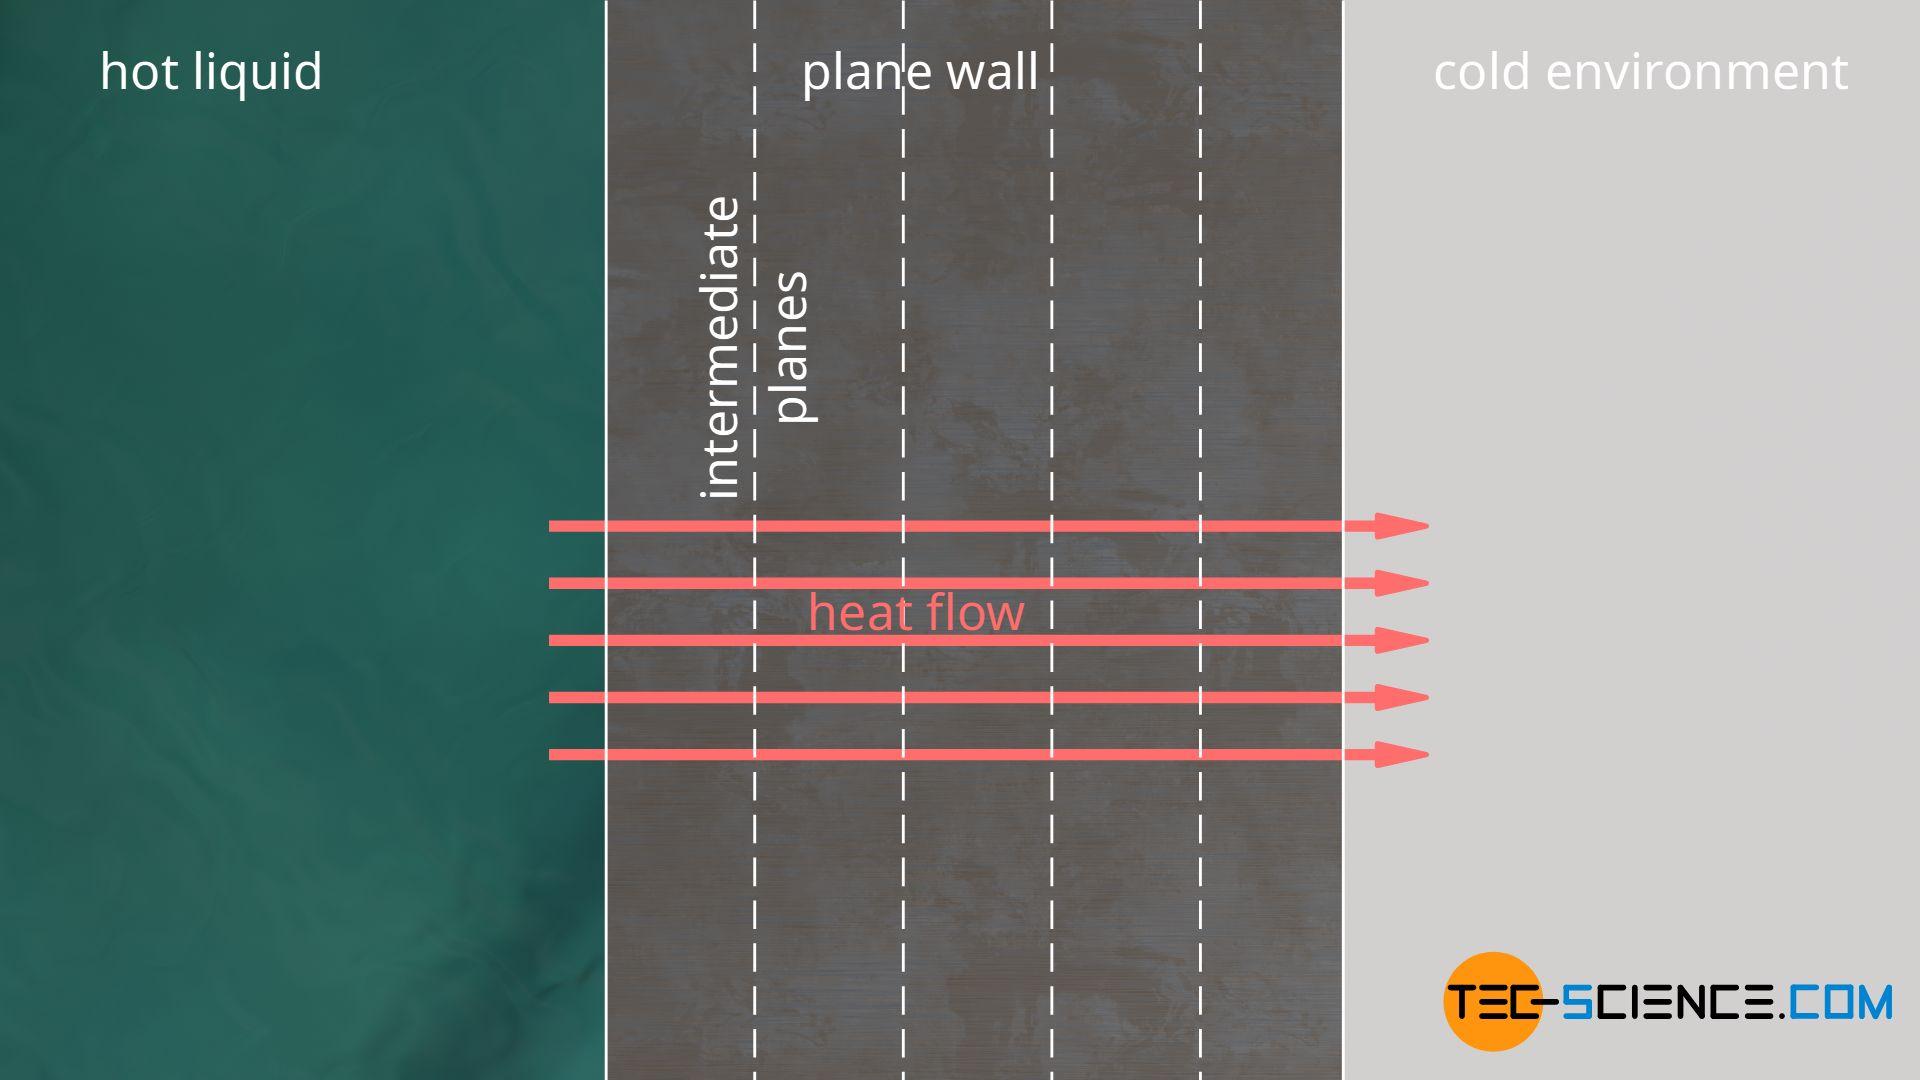 Heat flow through a plane wall